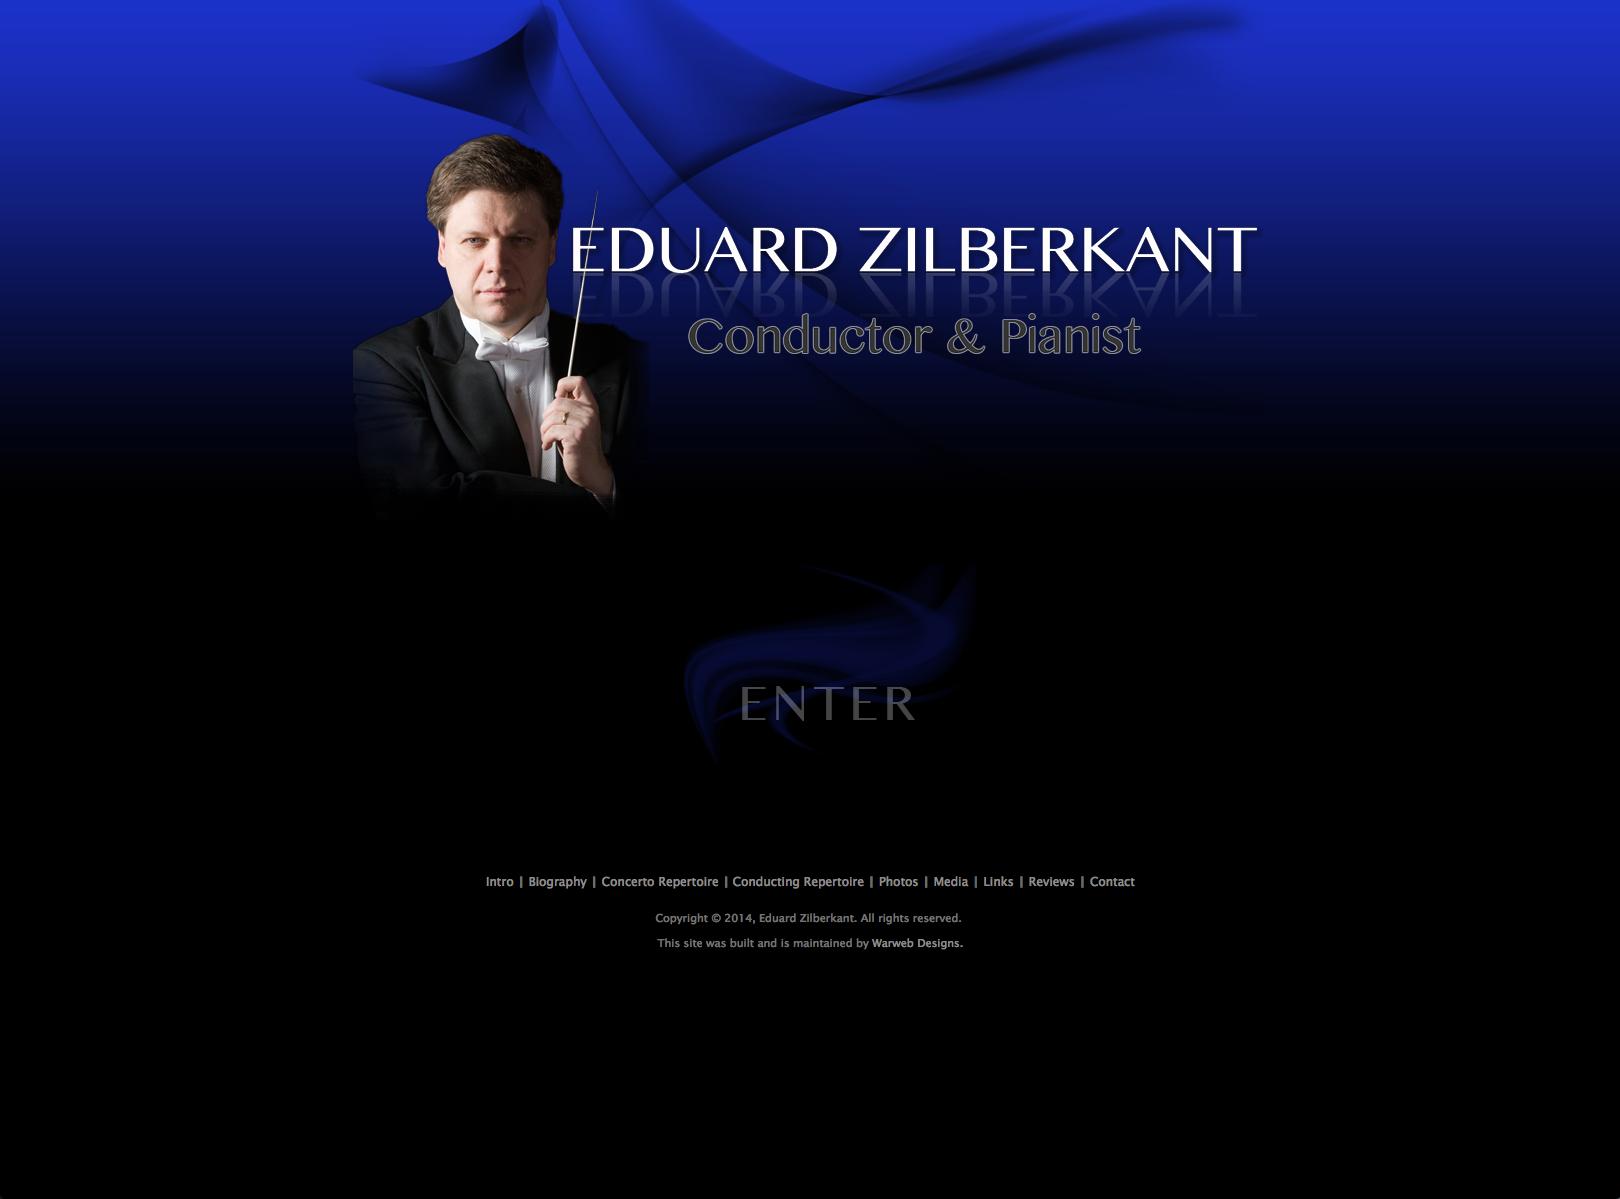 Eduard Zilberkant